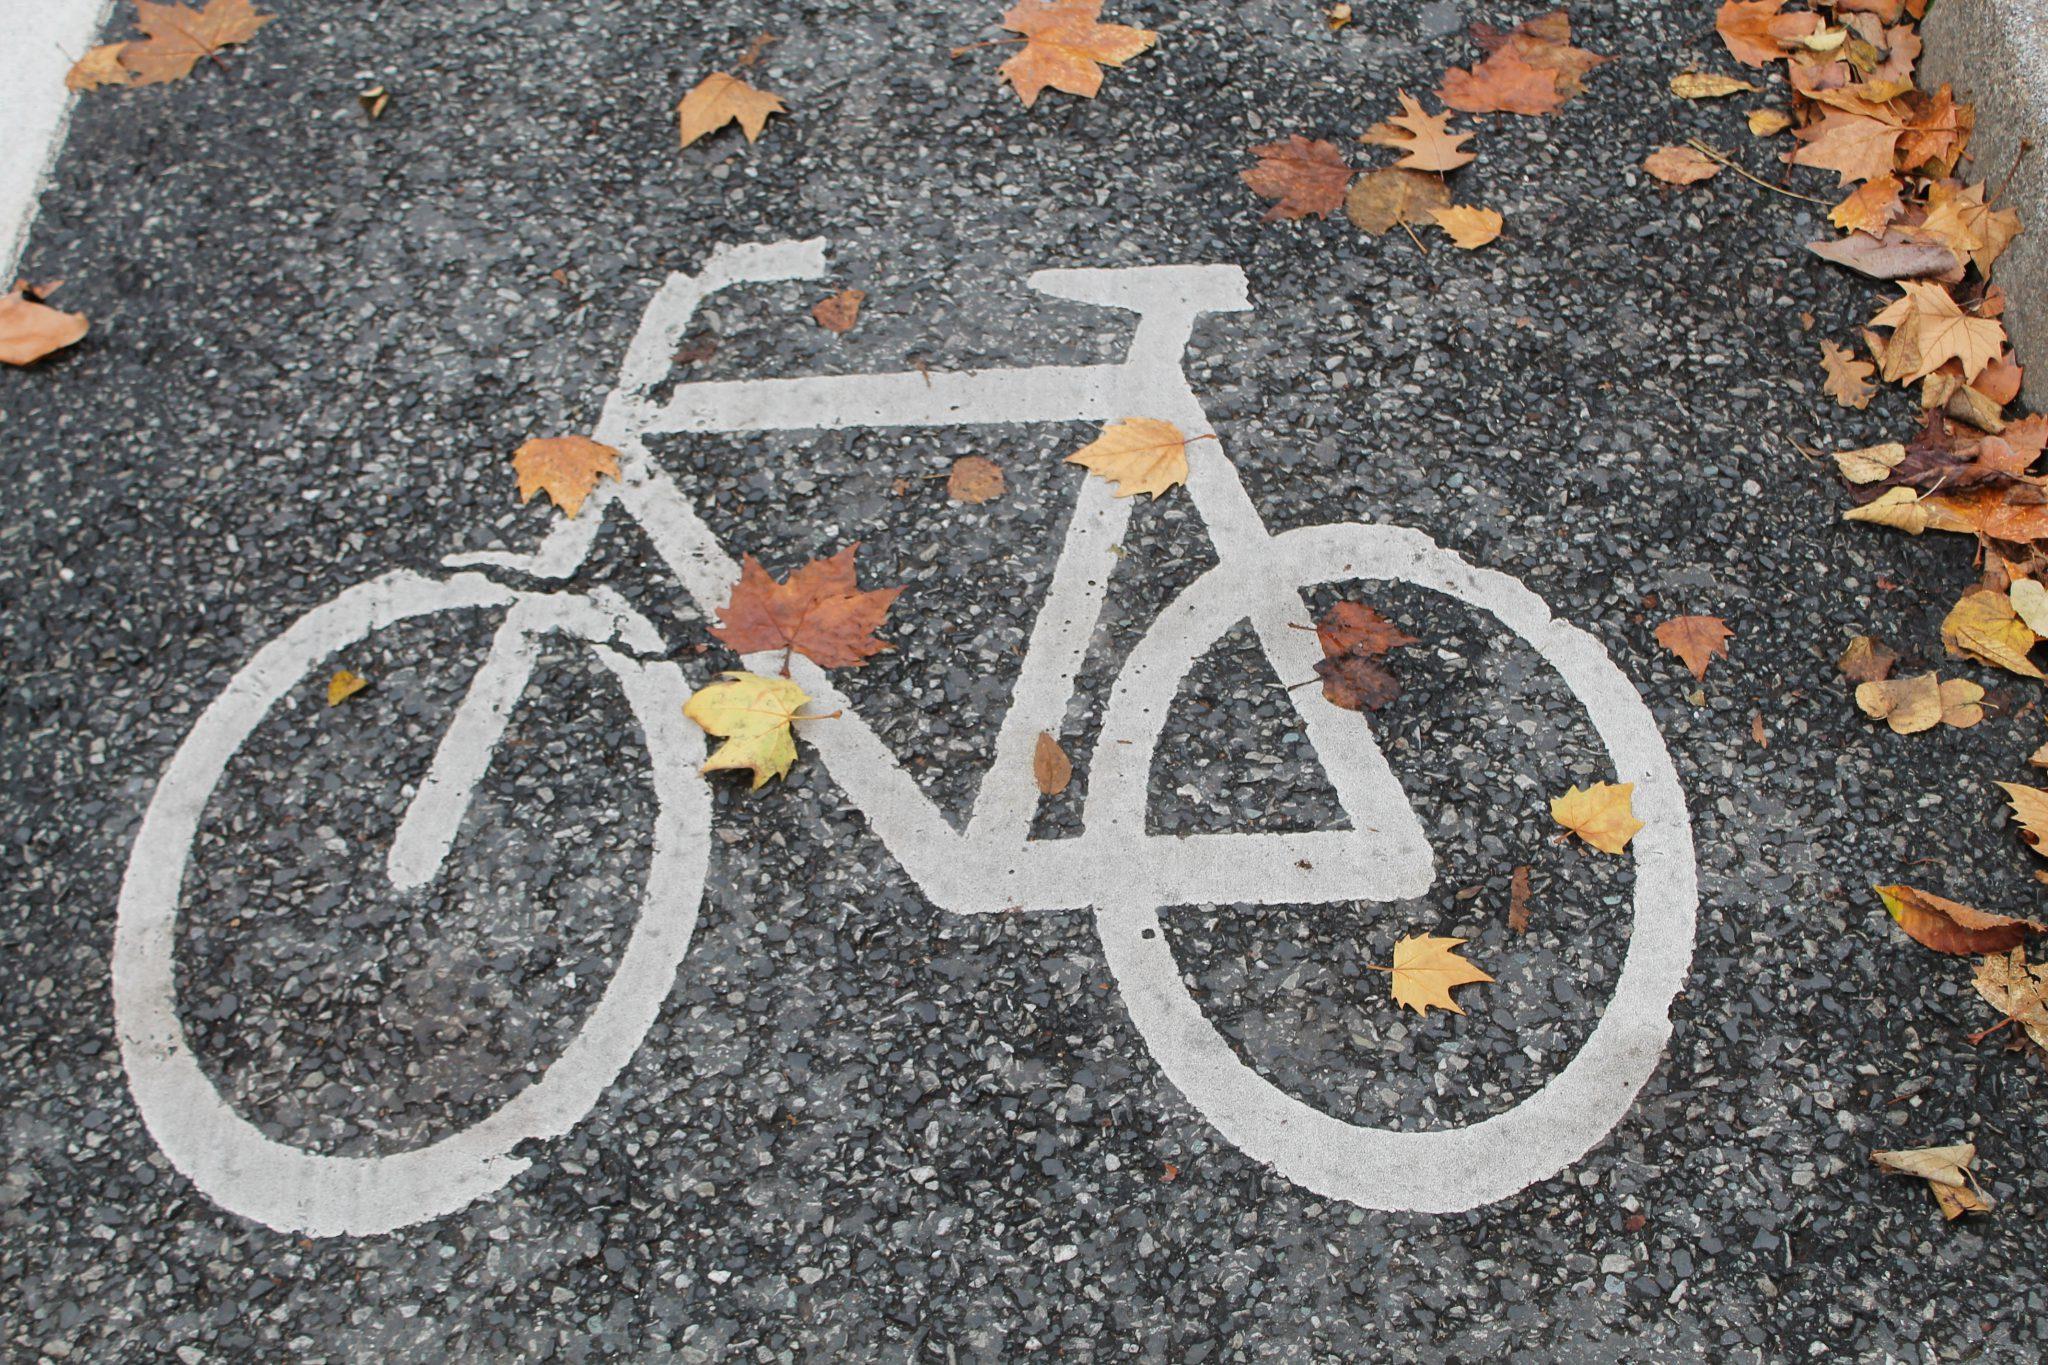 Fahrrad auf Asphalt gemalt